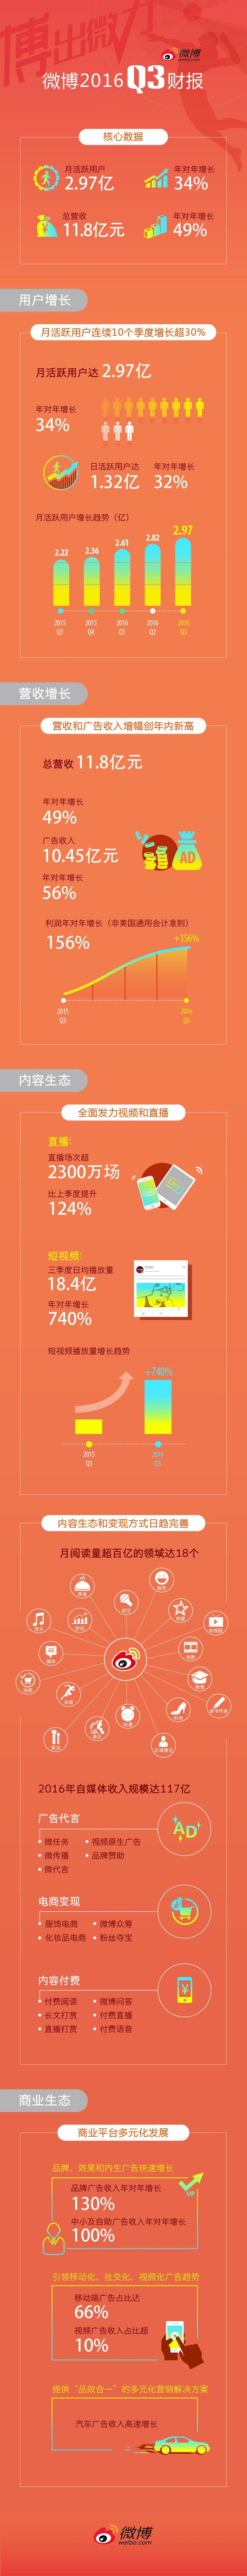 Weiboレポート